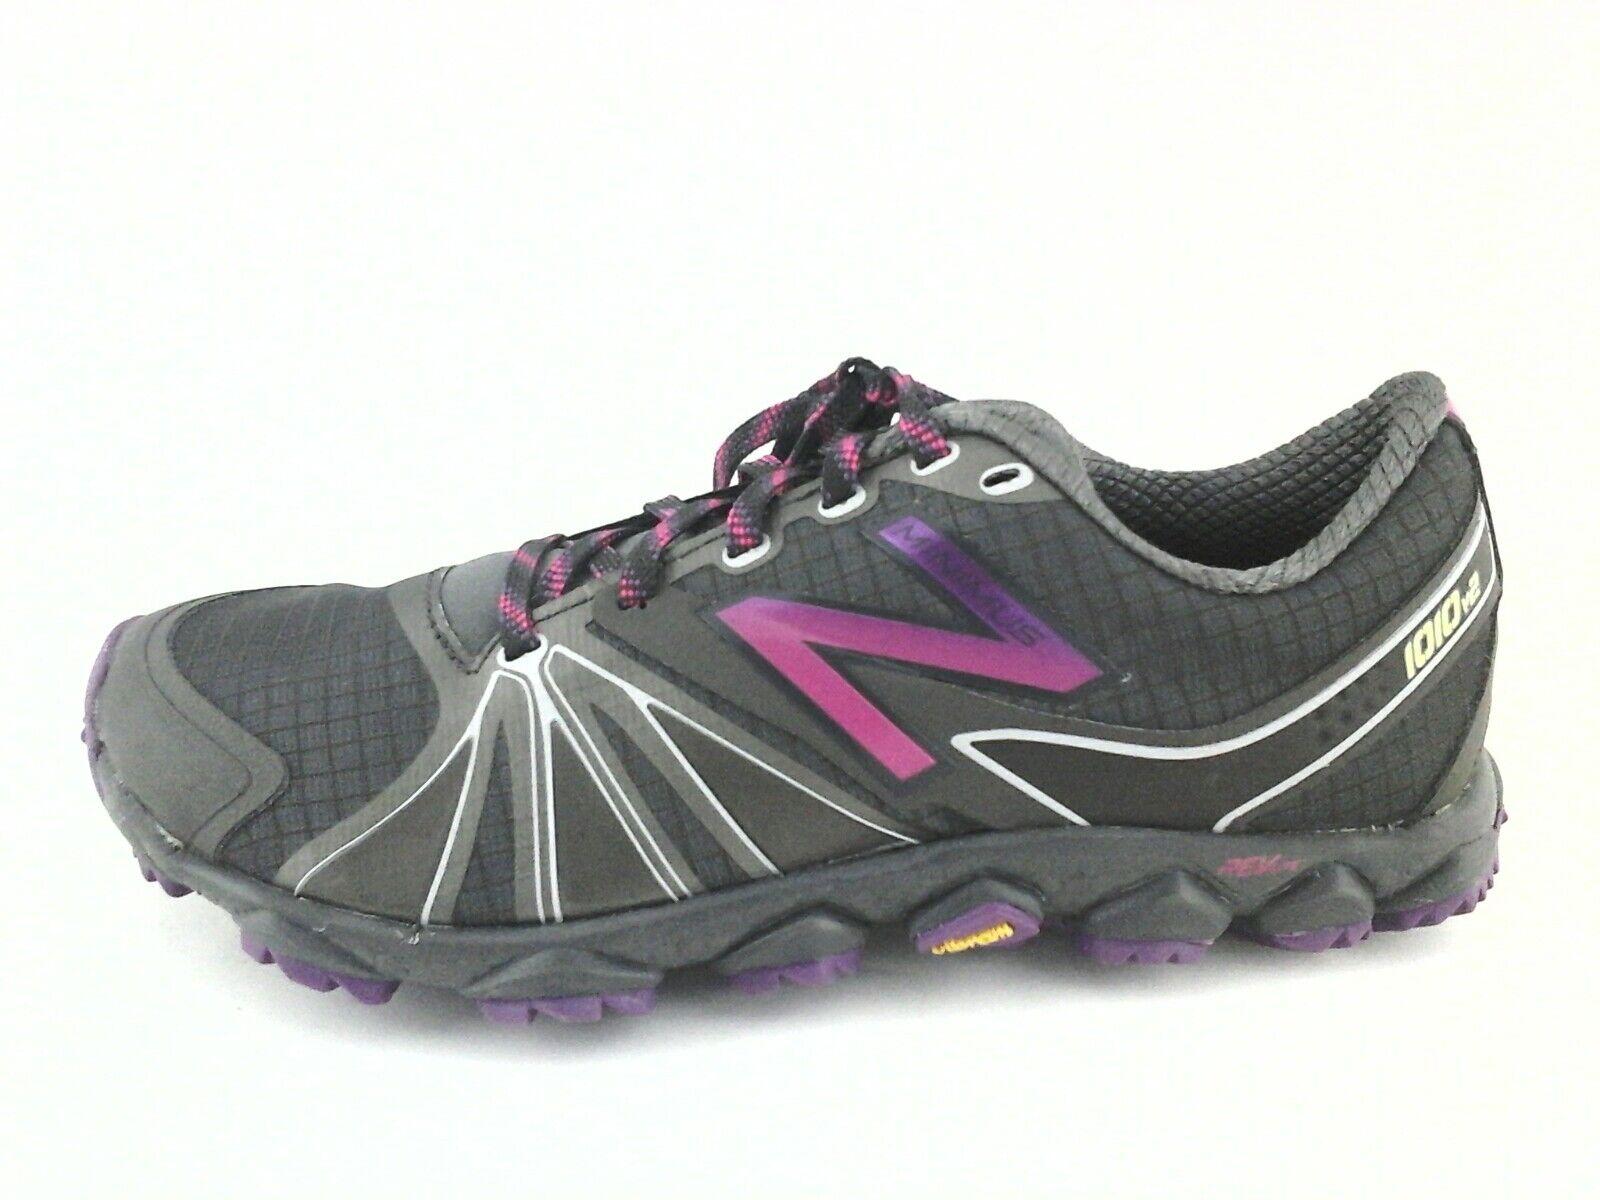 NEW BALANCE MINIMUS Sneakers 1010 femmes gris/rose Chaussures femmes 1010 US 6 EU 36.5 120 81cece